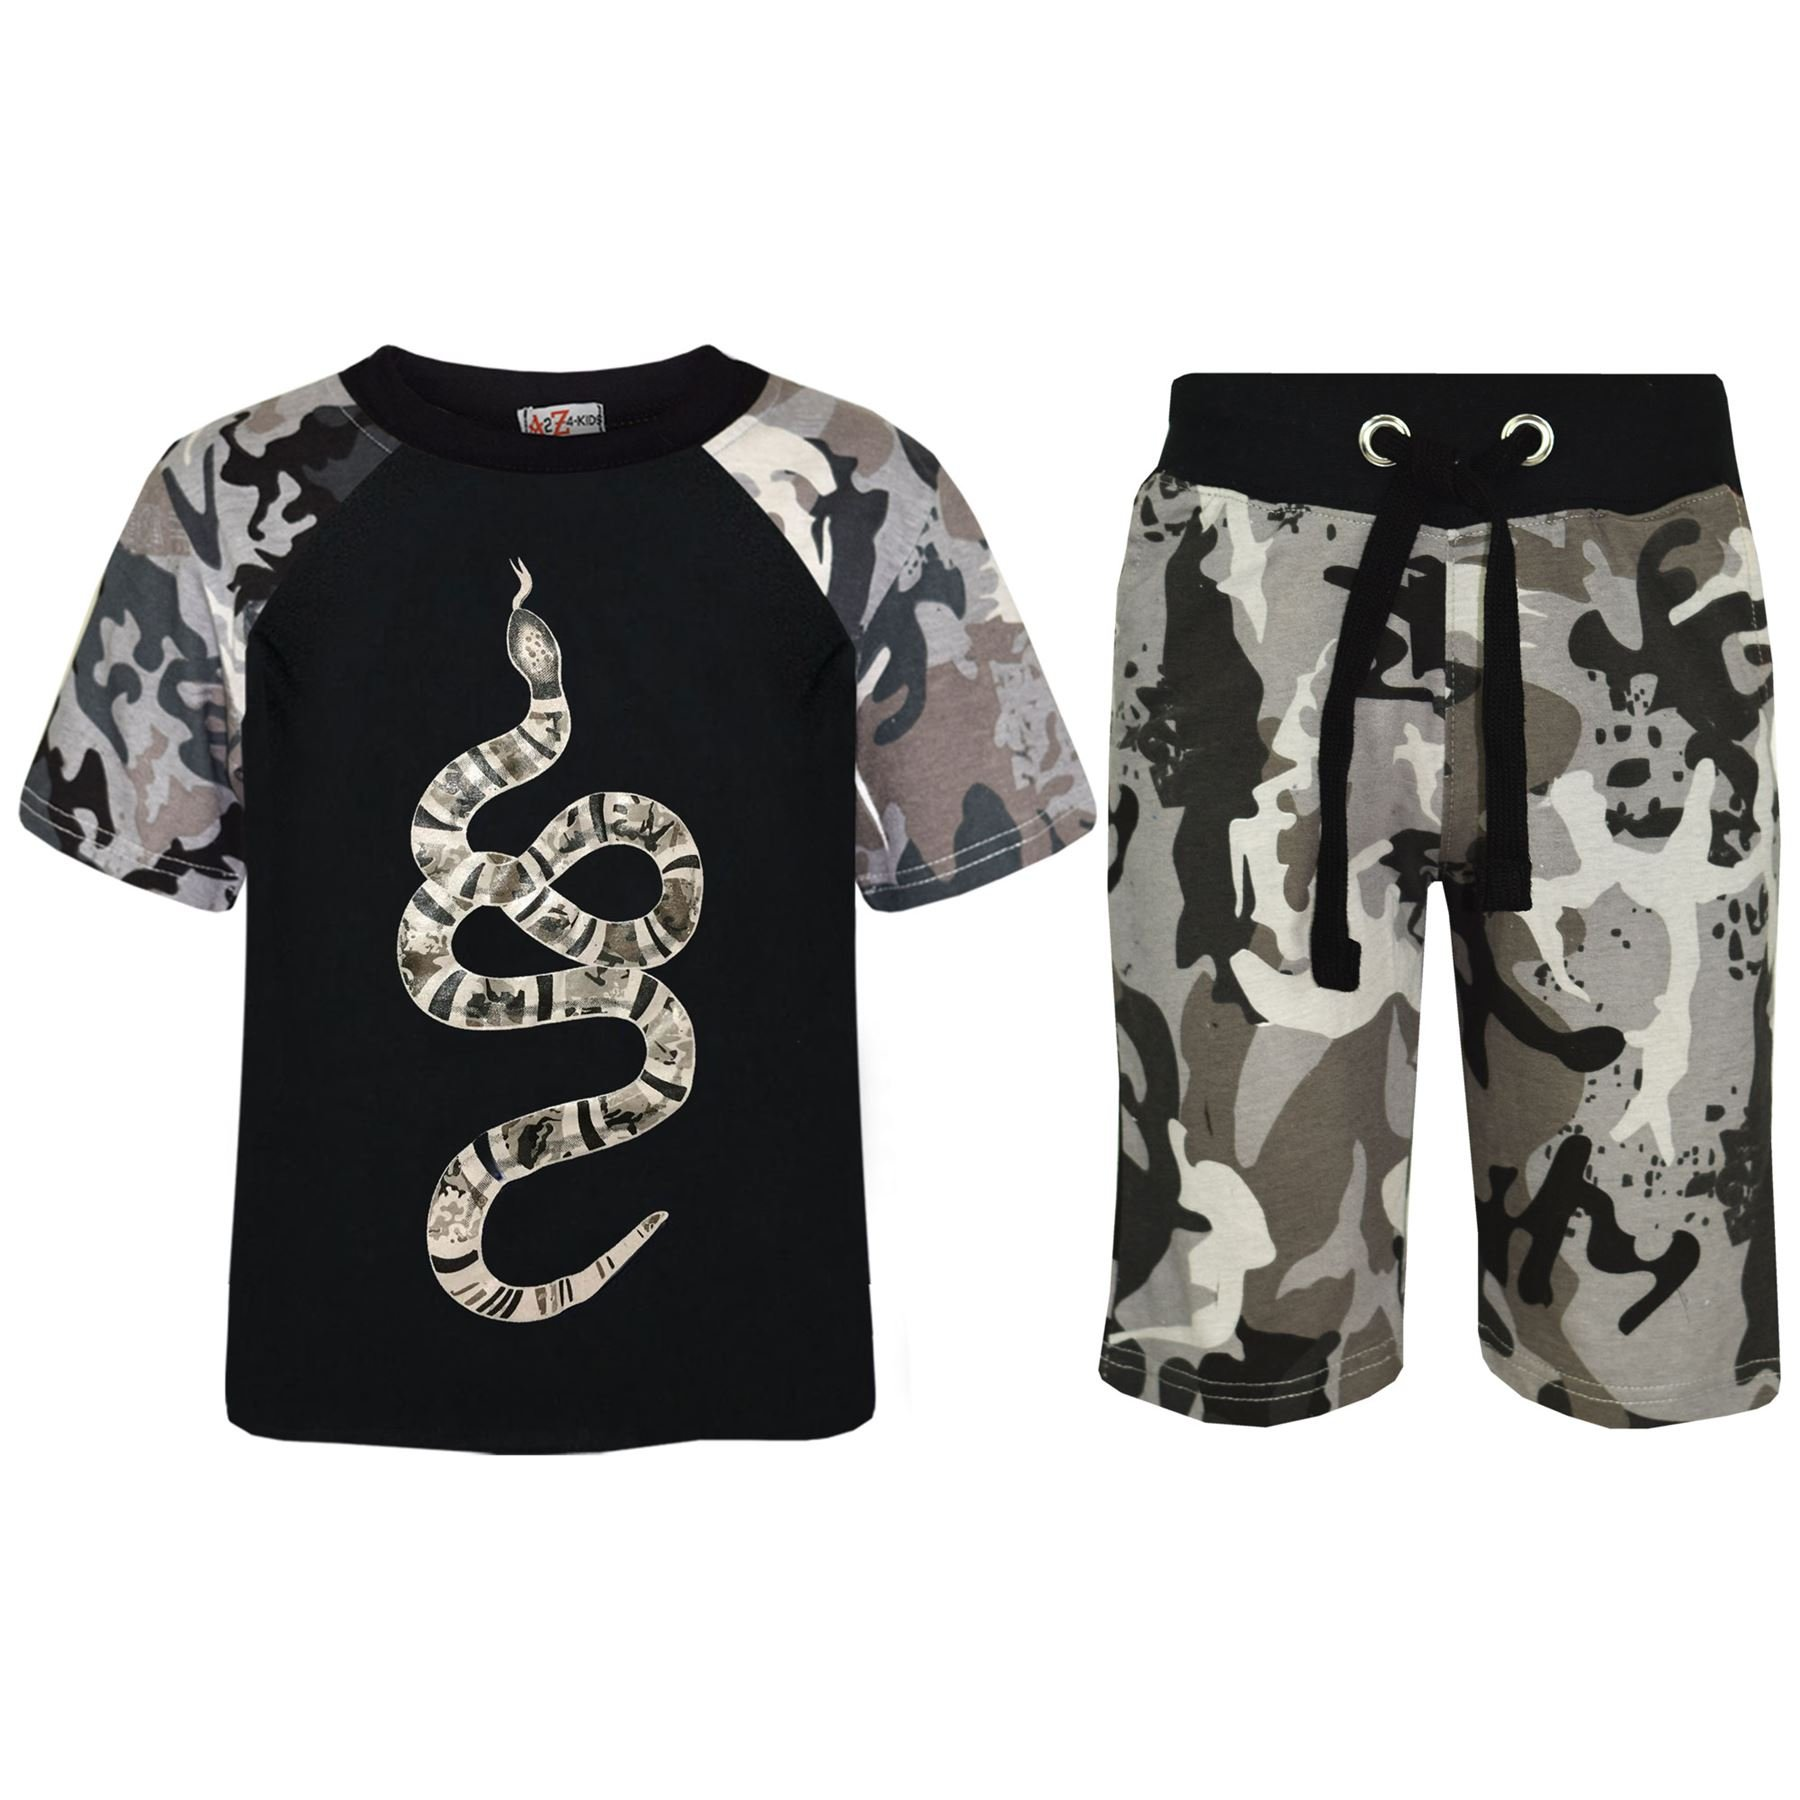 Kids Boys T Shirts Shorts Designer 100% Cotton Snake Print Top Short Set 5-13 Yr